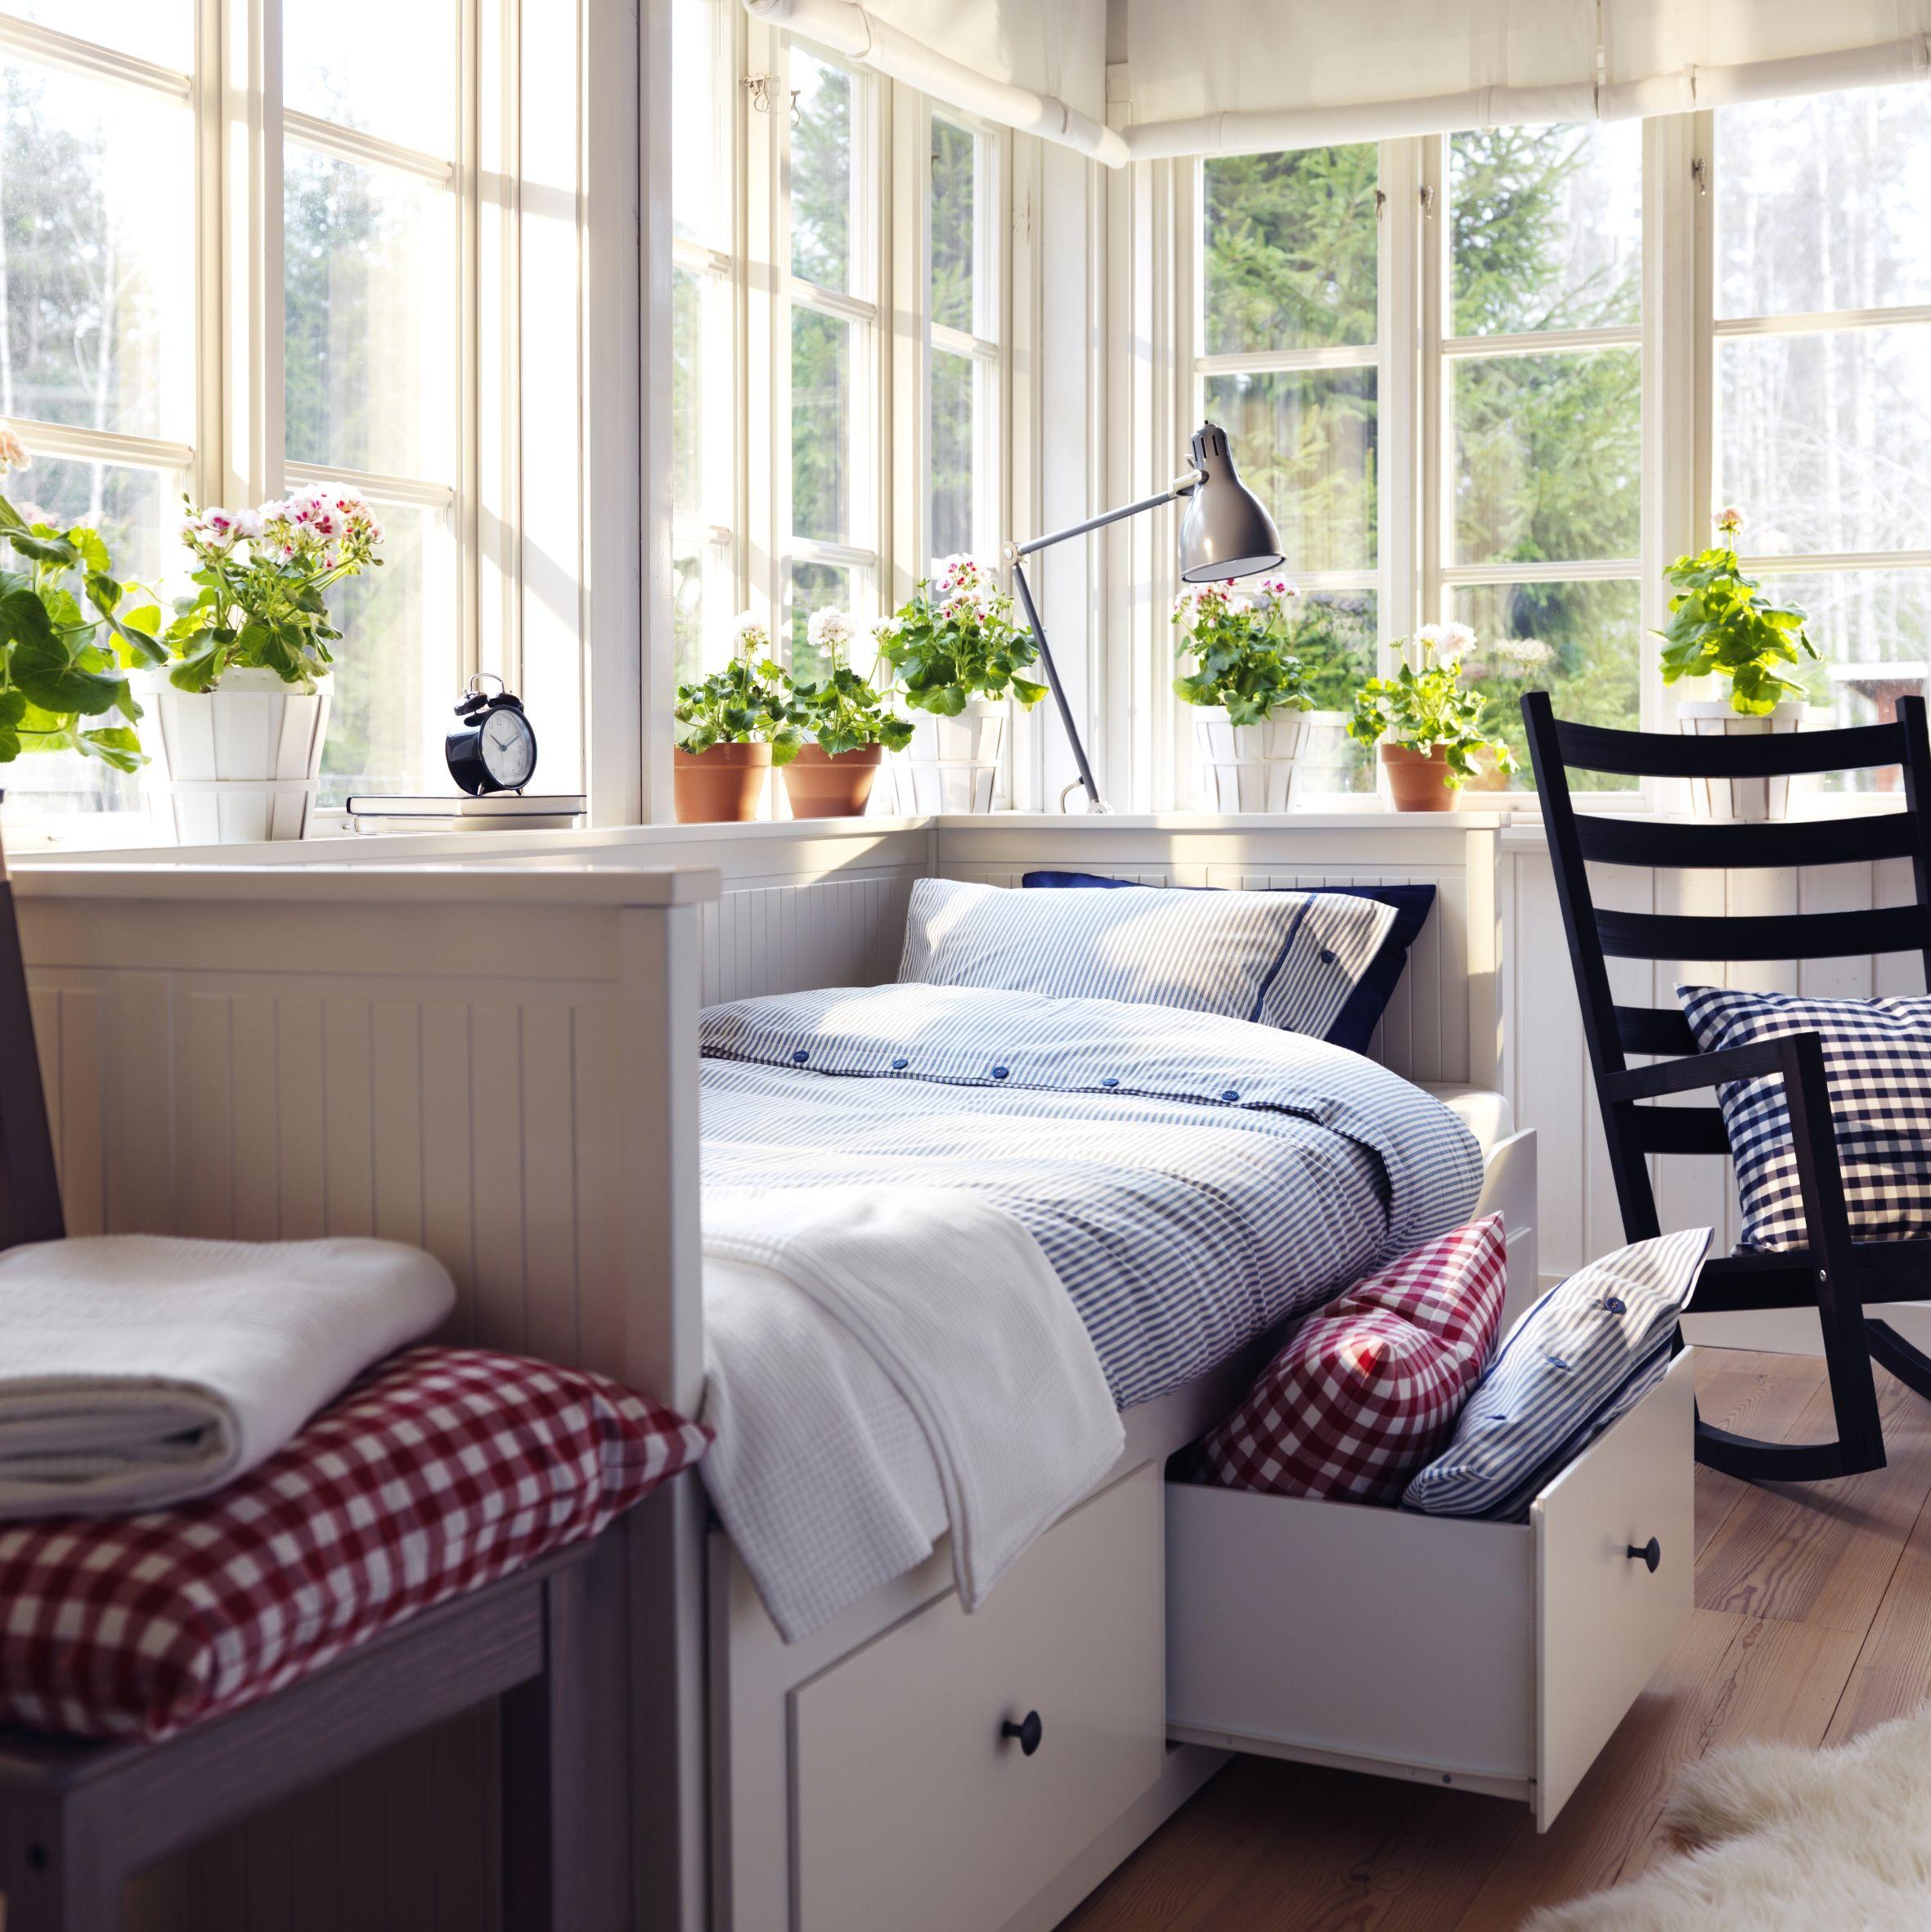 Small single bedroom ideas ikea